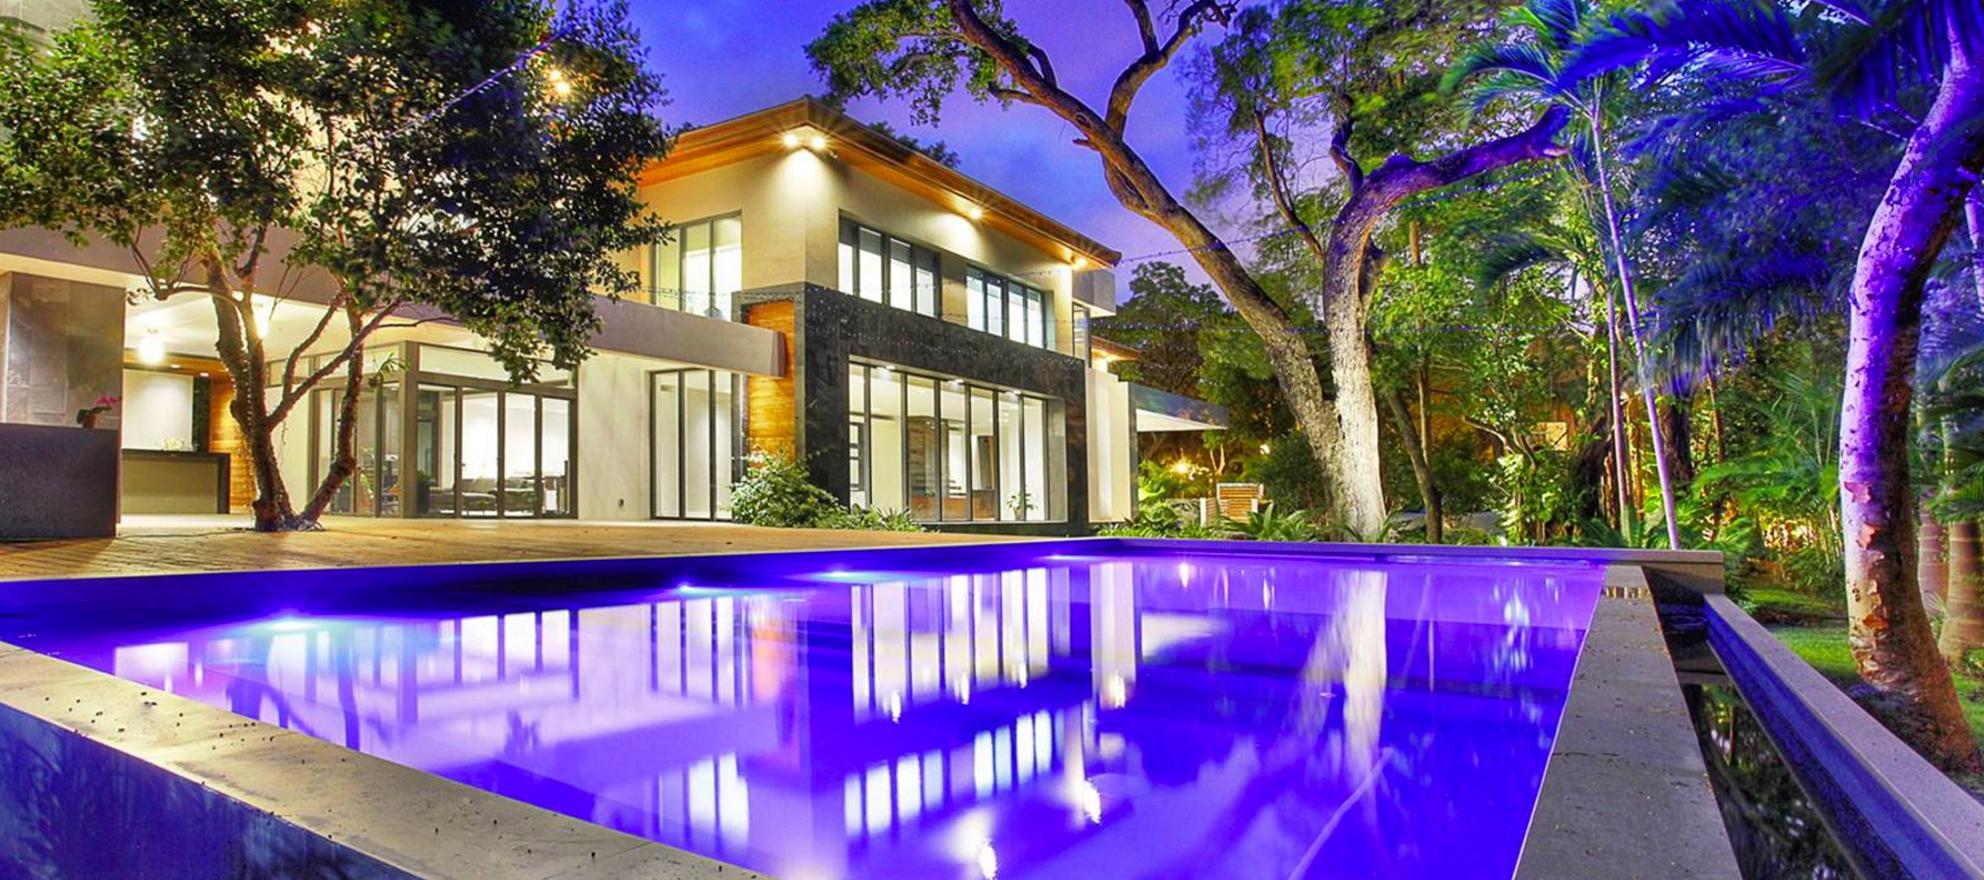 Miami homeowners